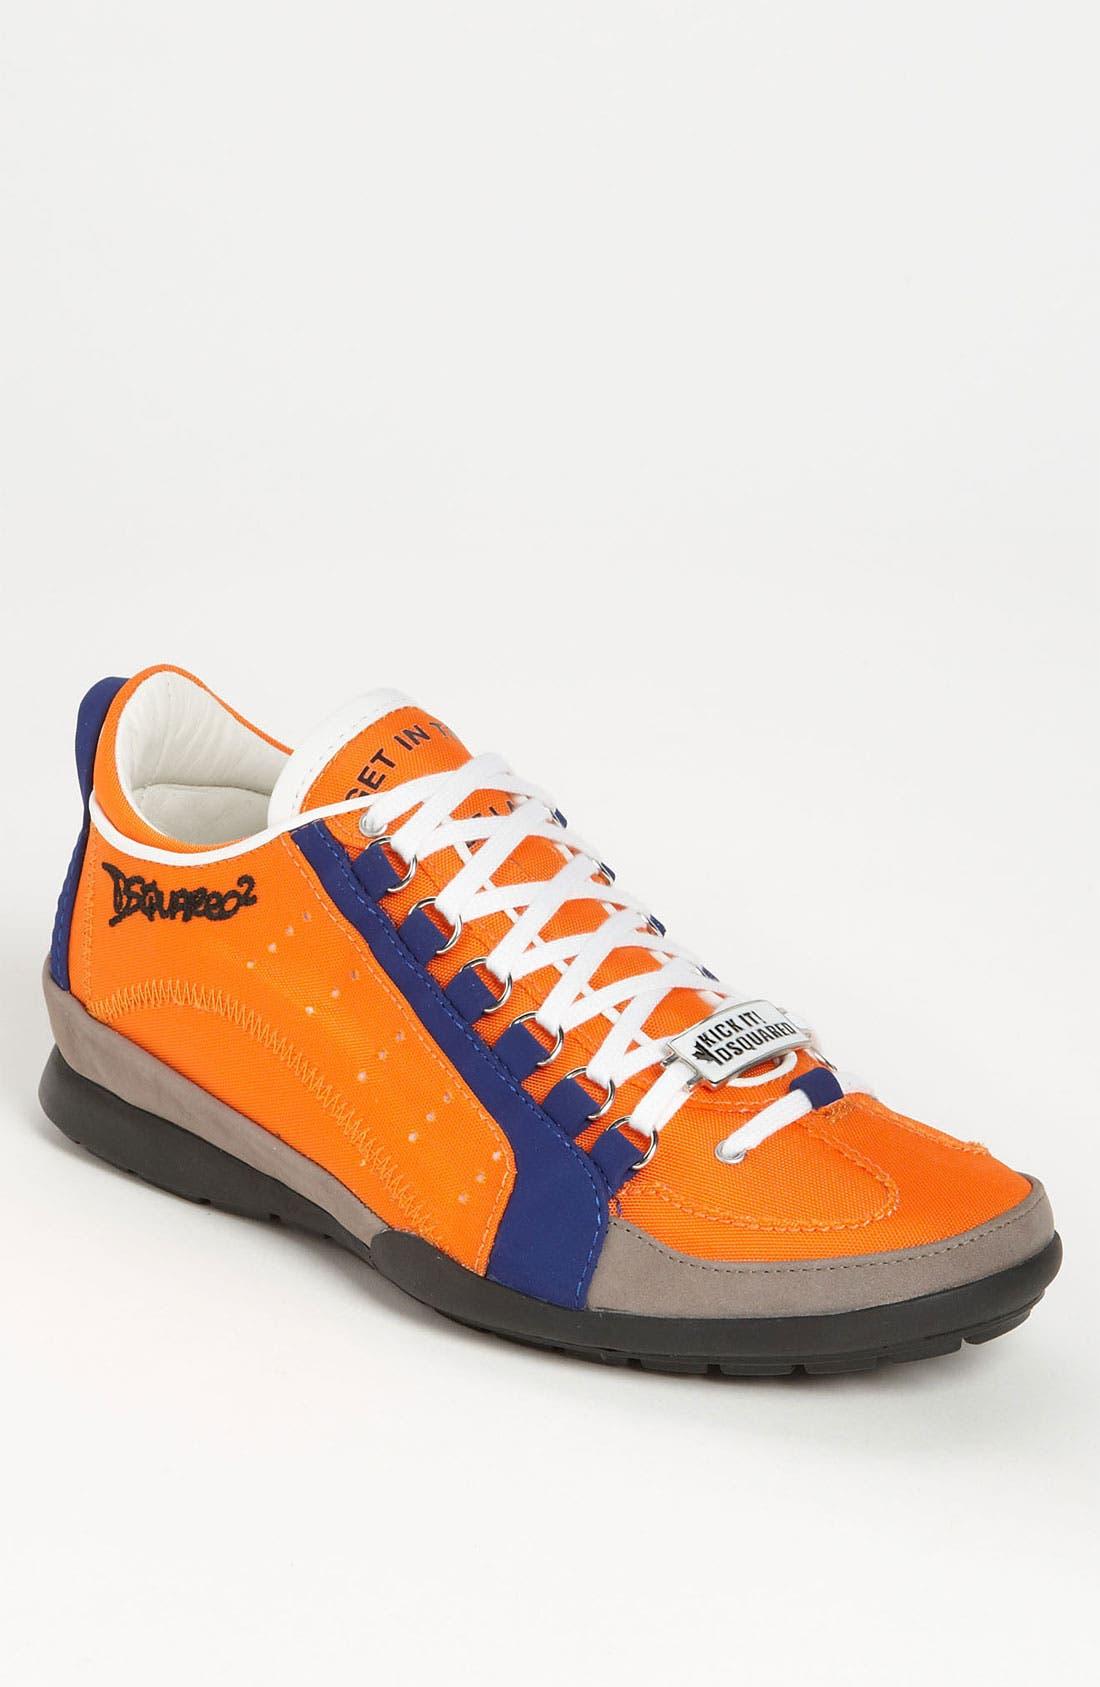 Alternate Image 1 Selected - Dsquared2 '552' Sneaker